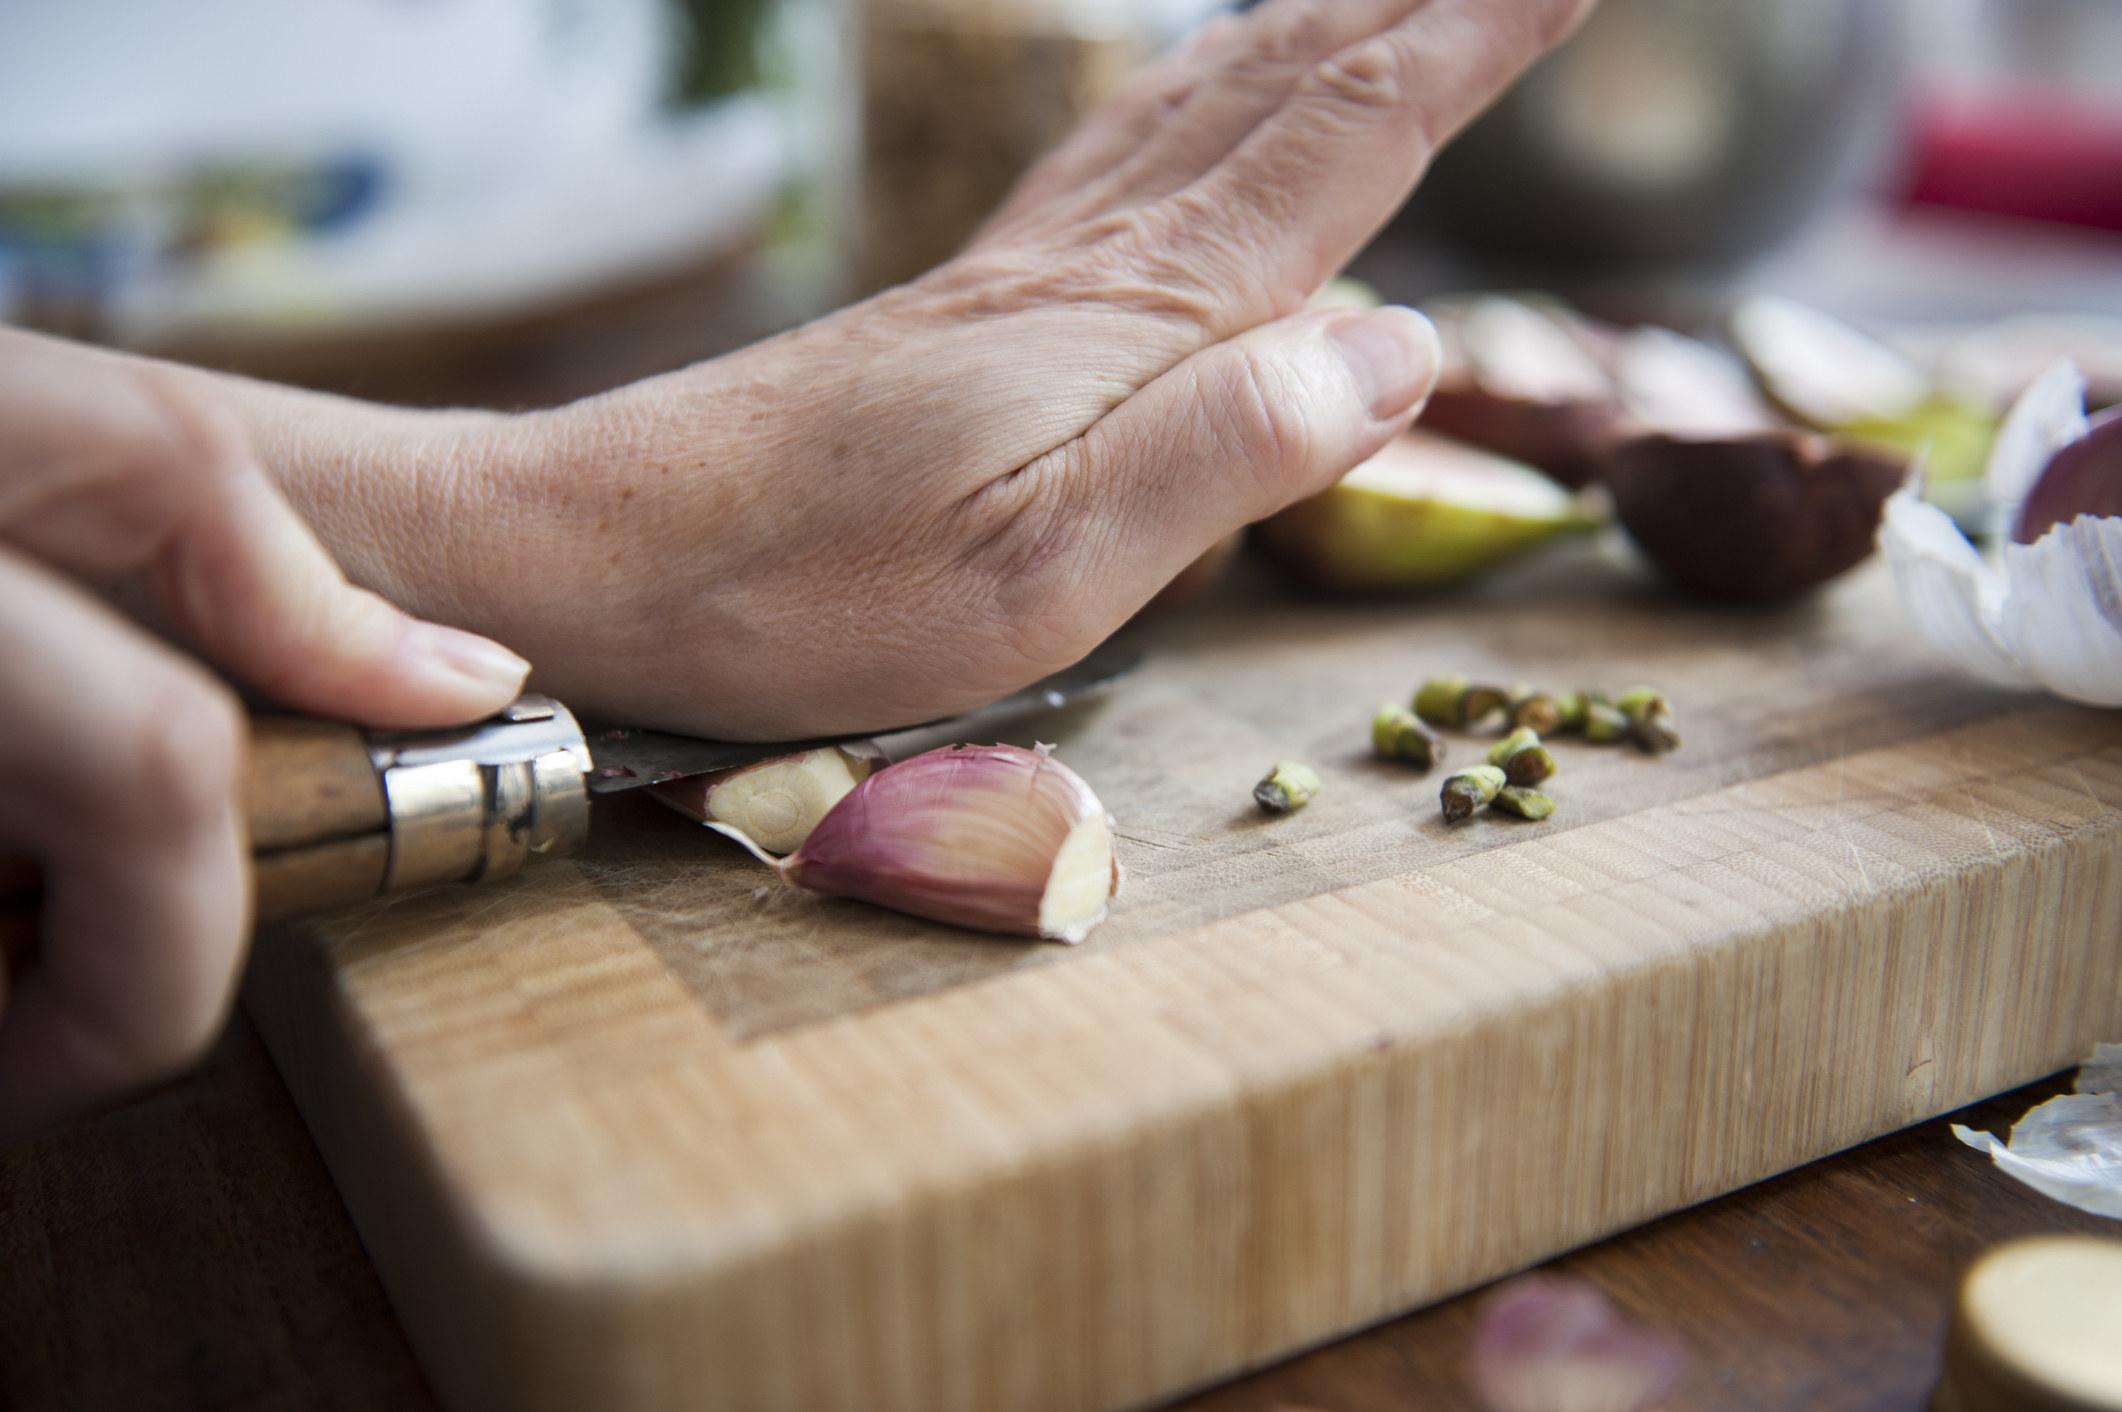 Someone peeling garlic on a cutting board